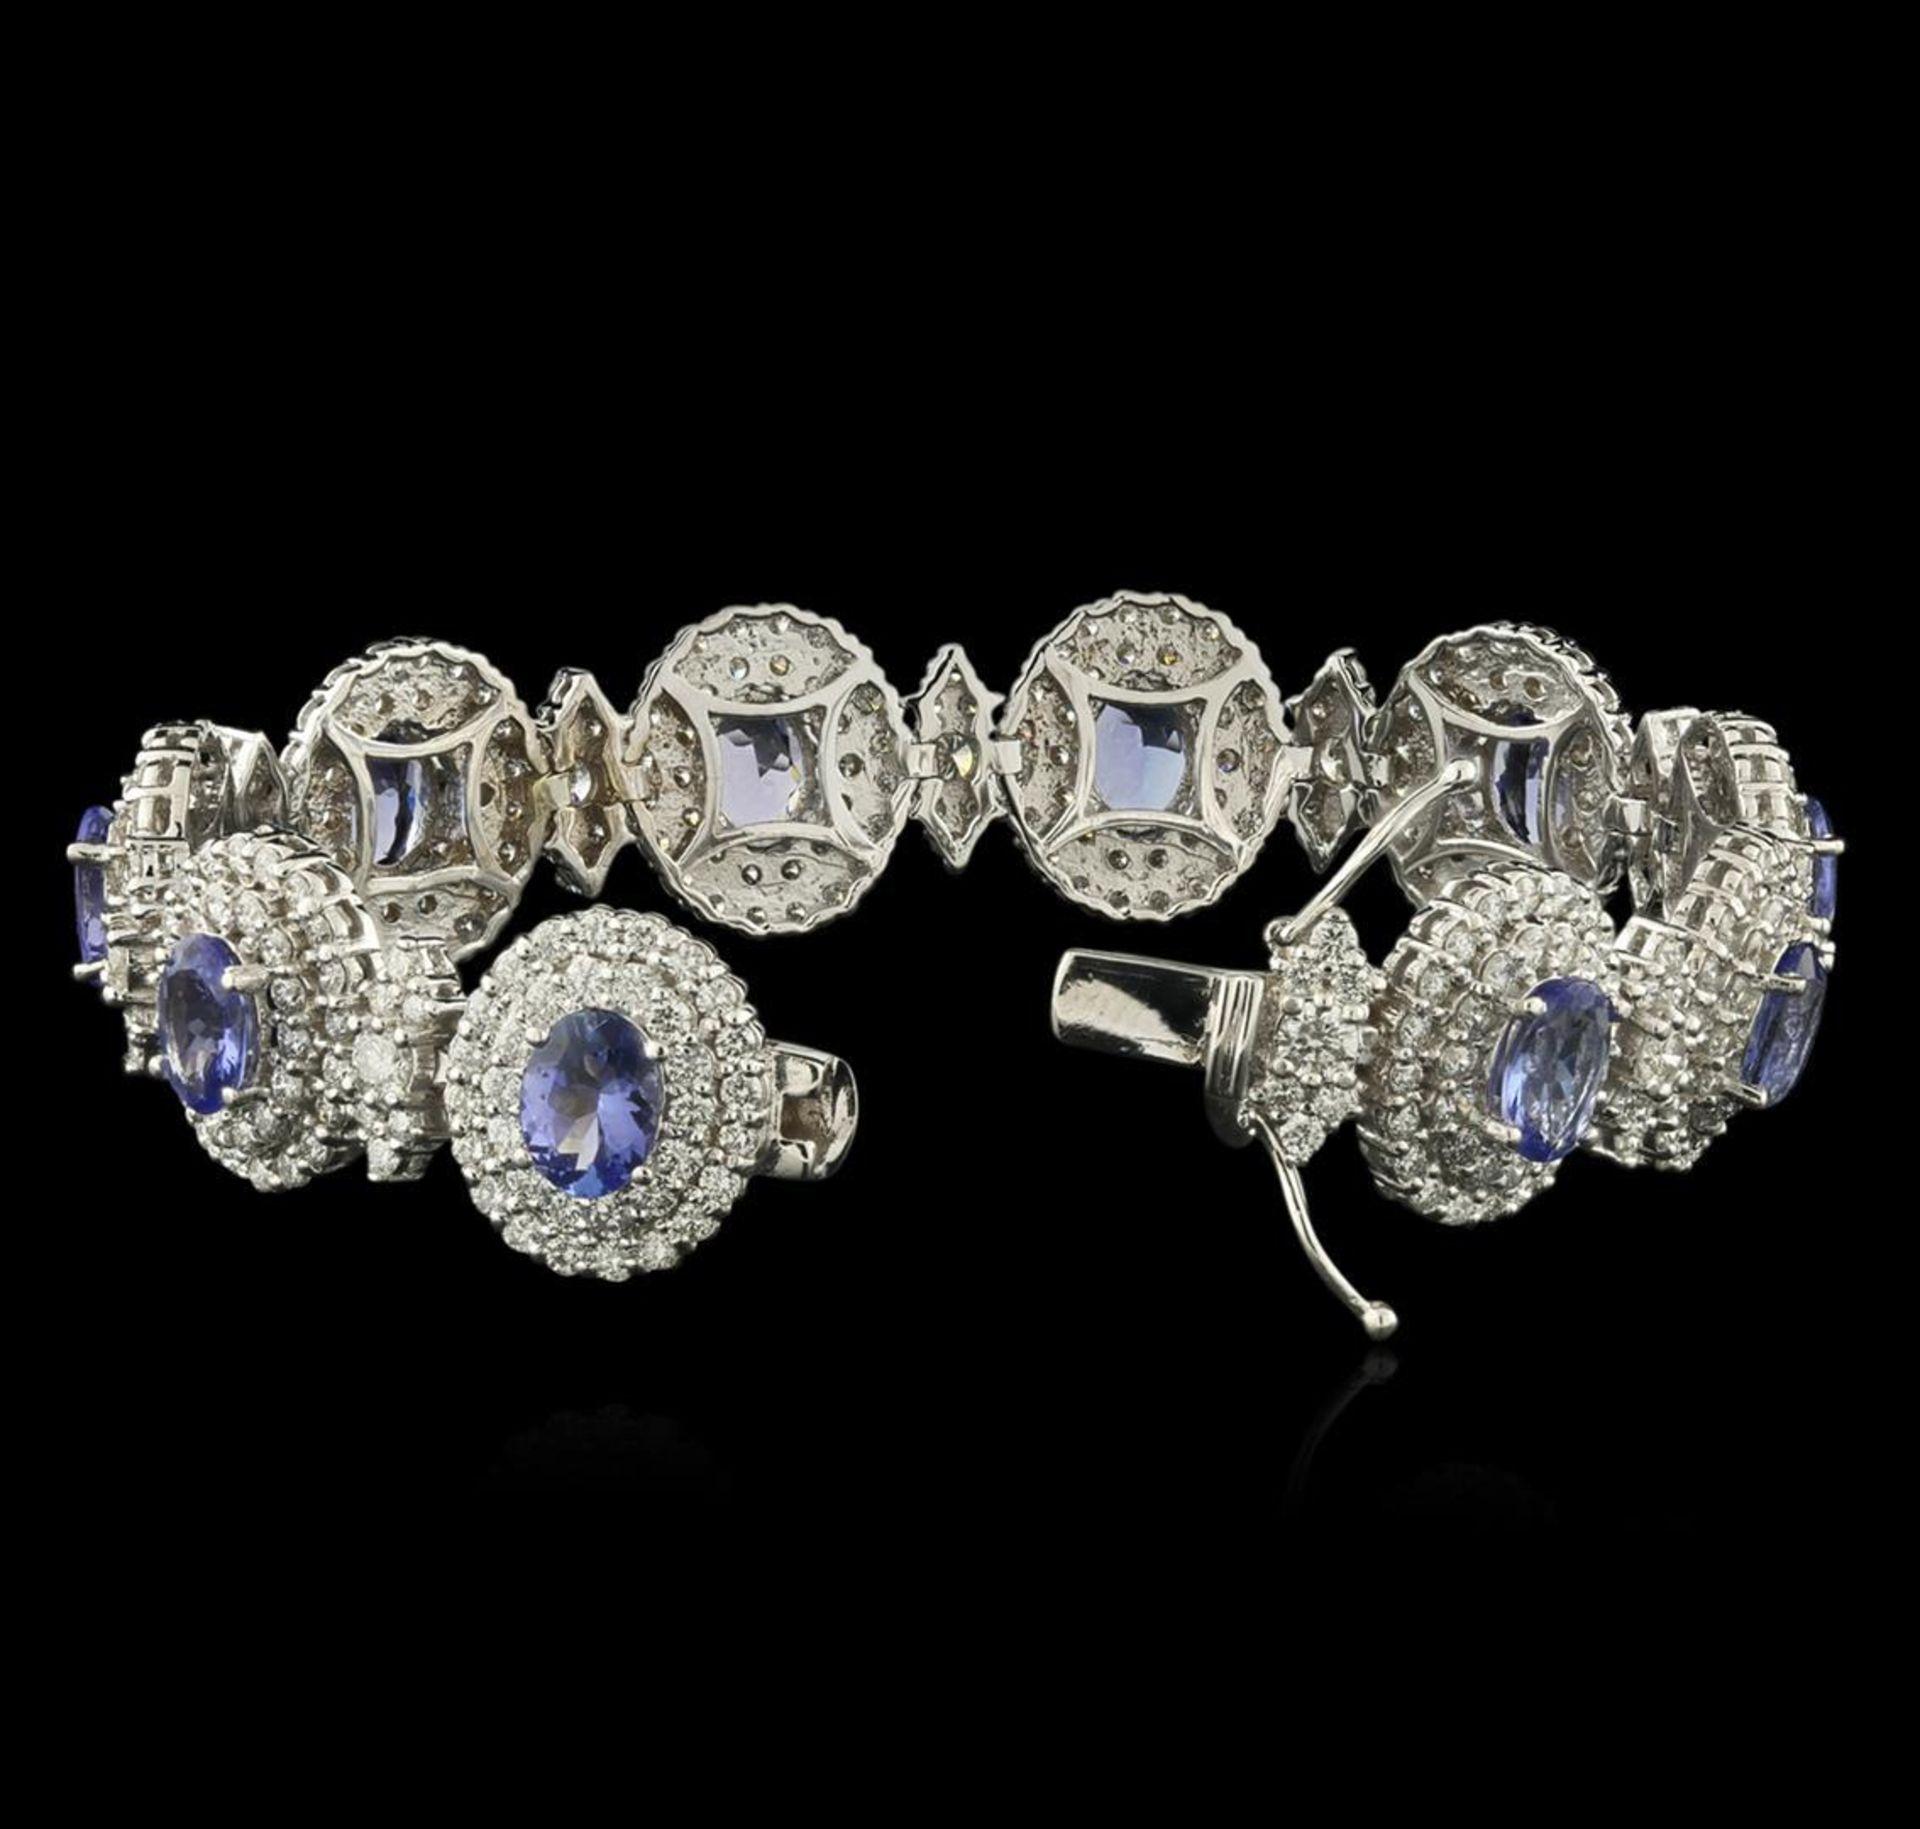 14KT White Gold 11.11ctw Tanzanite and Diamond Bracelet - Image 3 of 4